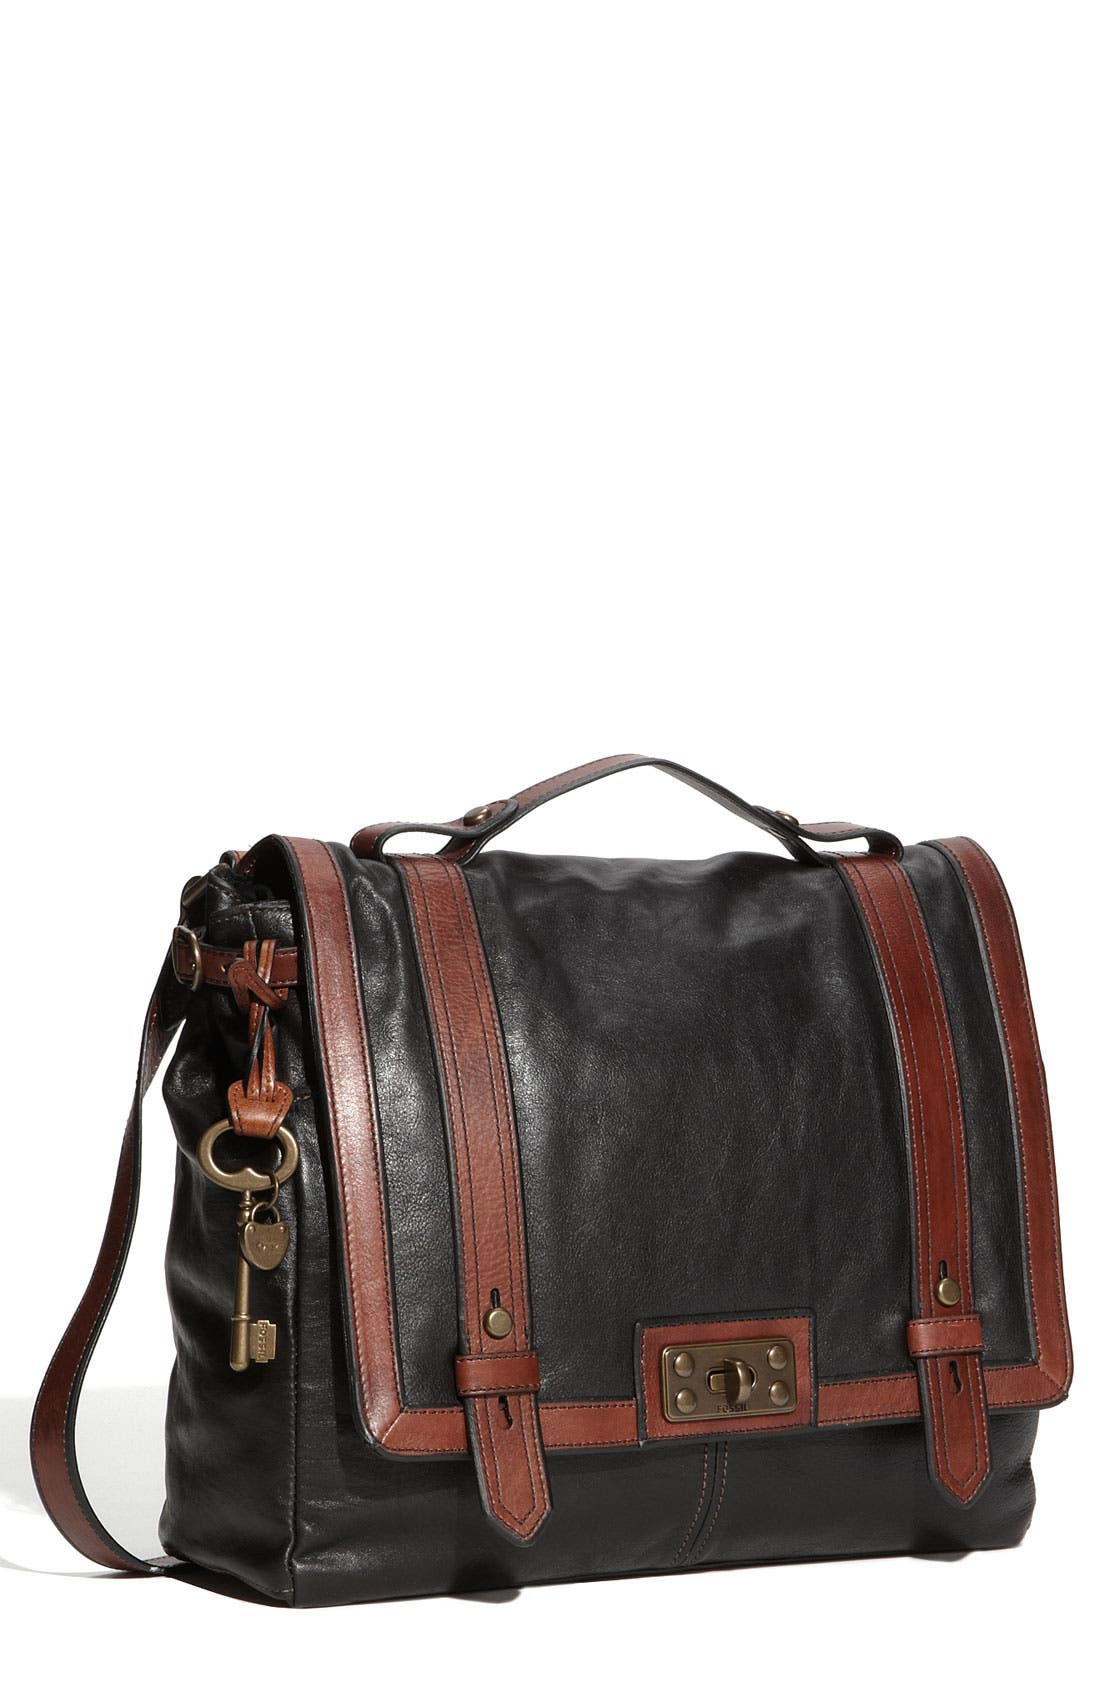 Main Image - Fossil 'Vintage Reissue' Crossbody Bag